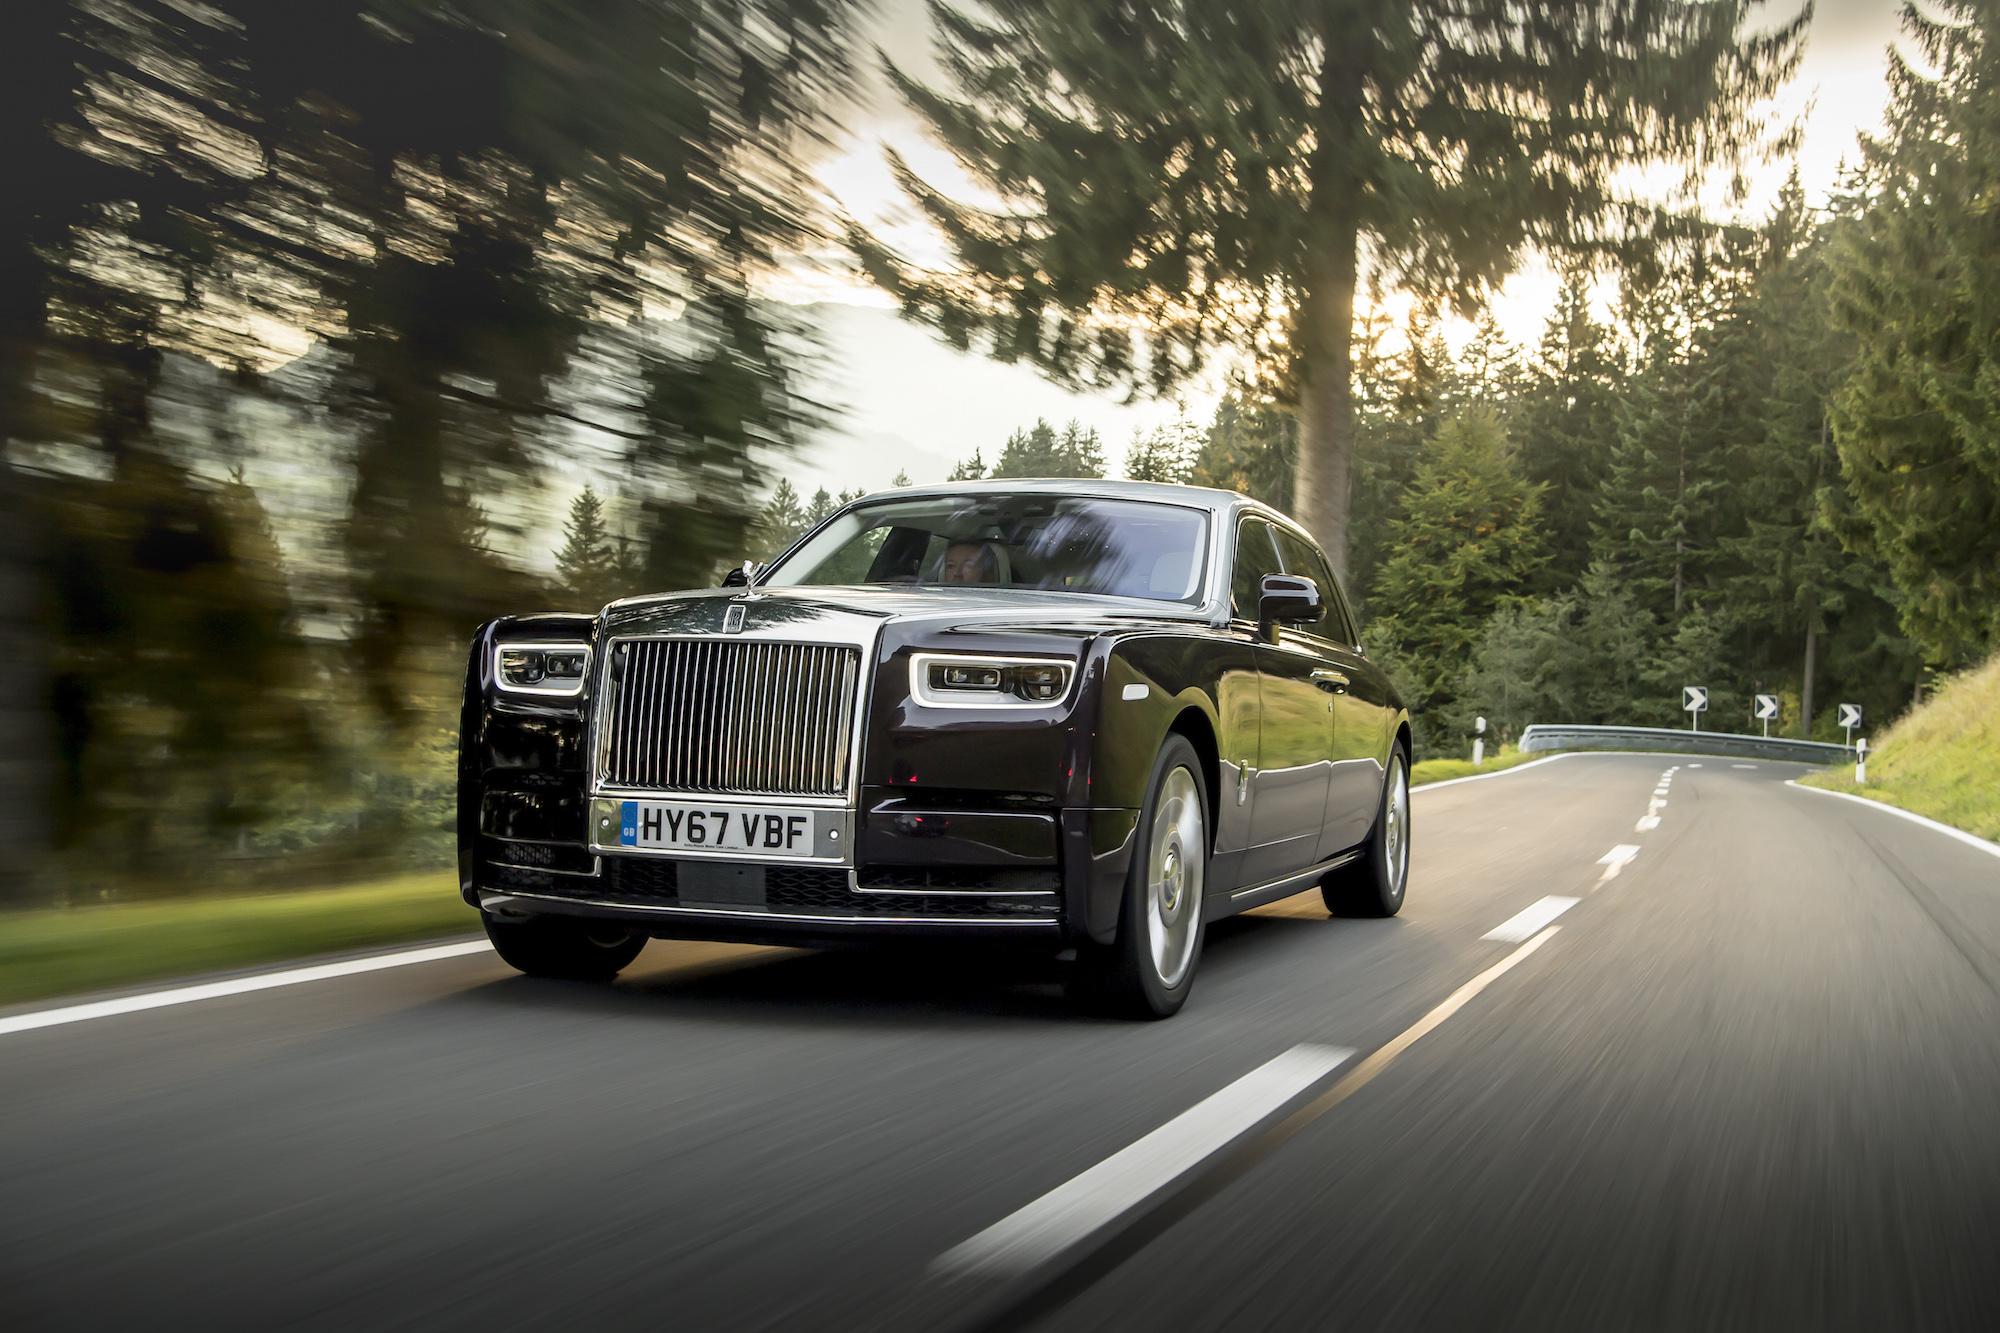 Matte Black Luxury Car Wallpaper First Look 2018 Rolls Royce Phantom Viii Canadian Auto